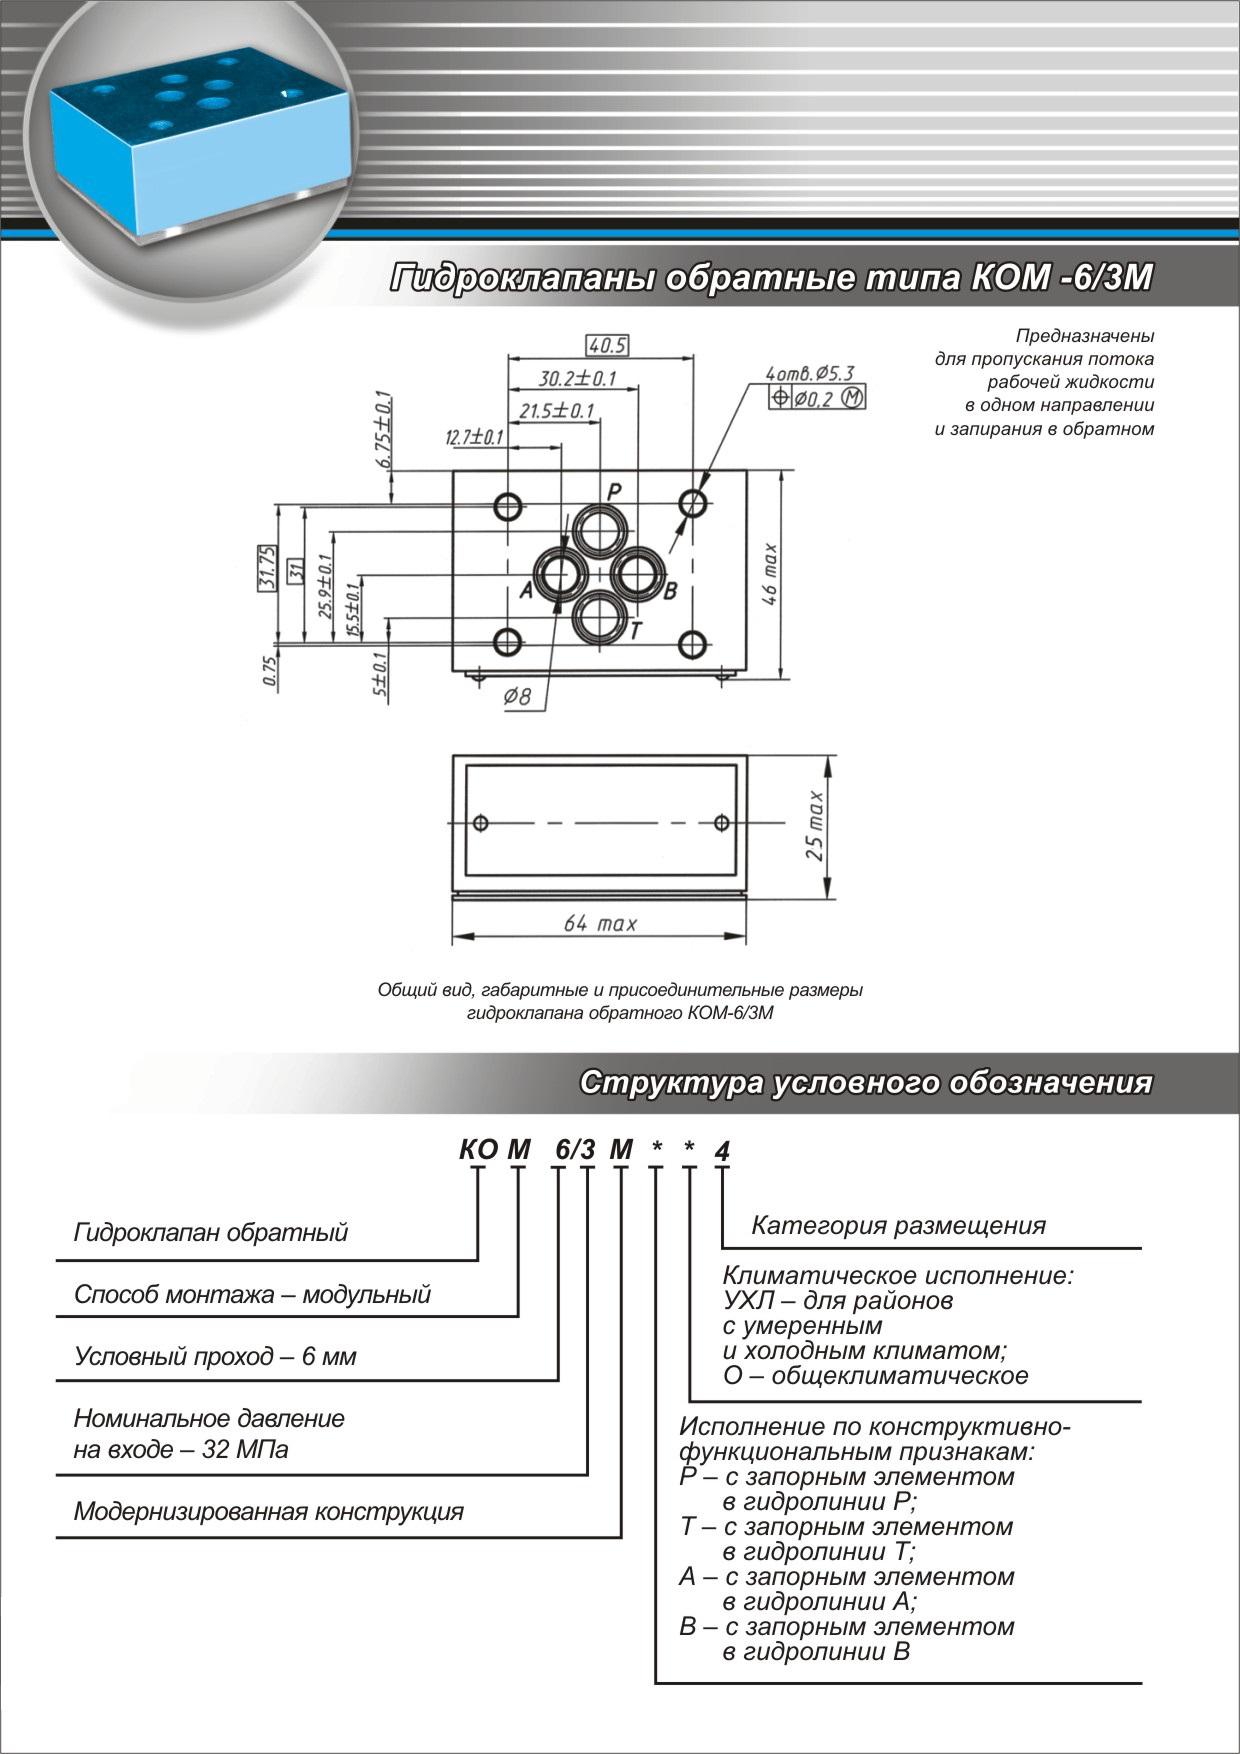 Gidroklapany-obratnye-tipa-KOM-6.3M